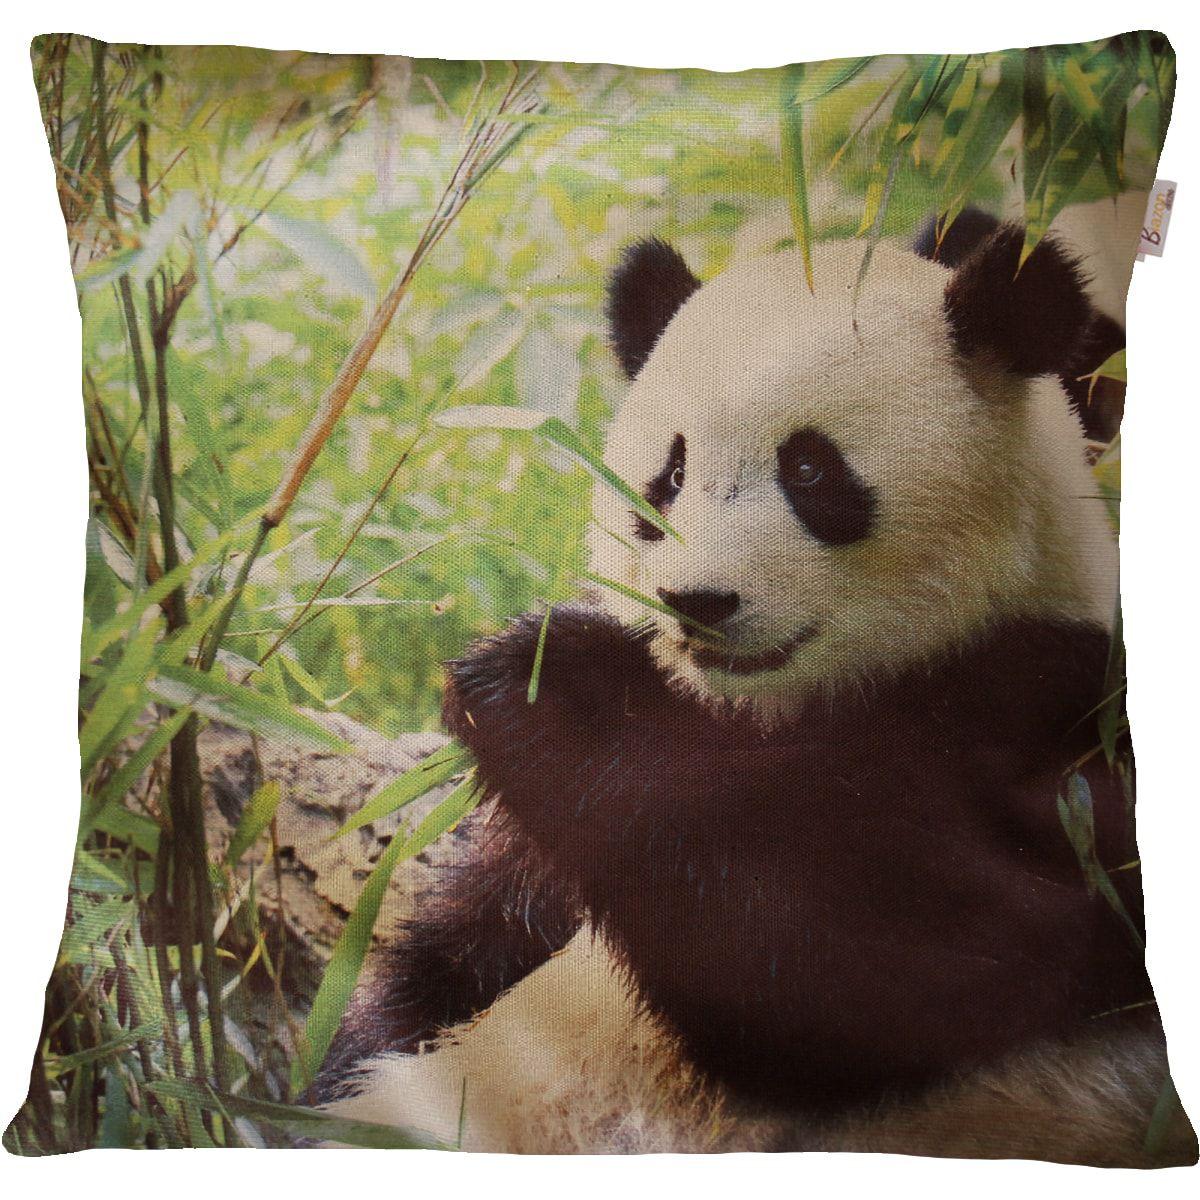 Capa de Almofada Decorativa Animal Panda 45x45cm